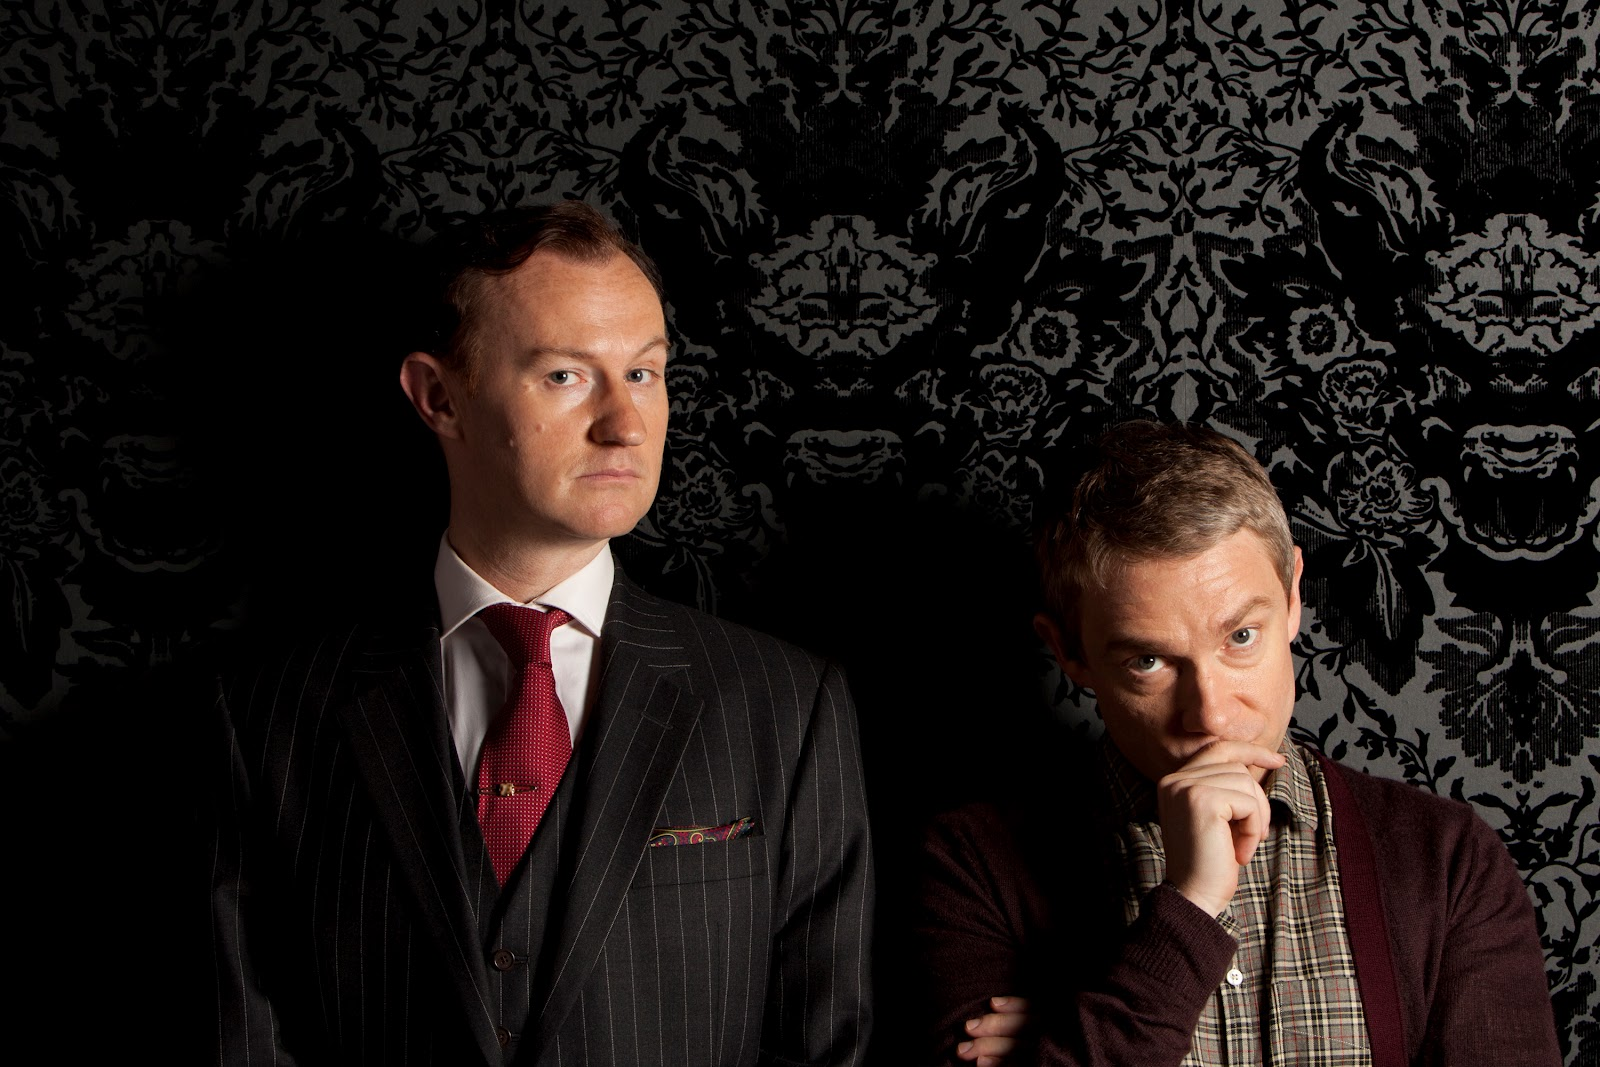 Mark Gatiss and Martin Freeman as Mycroft Holmes and John Watson